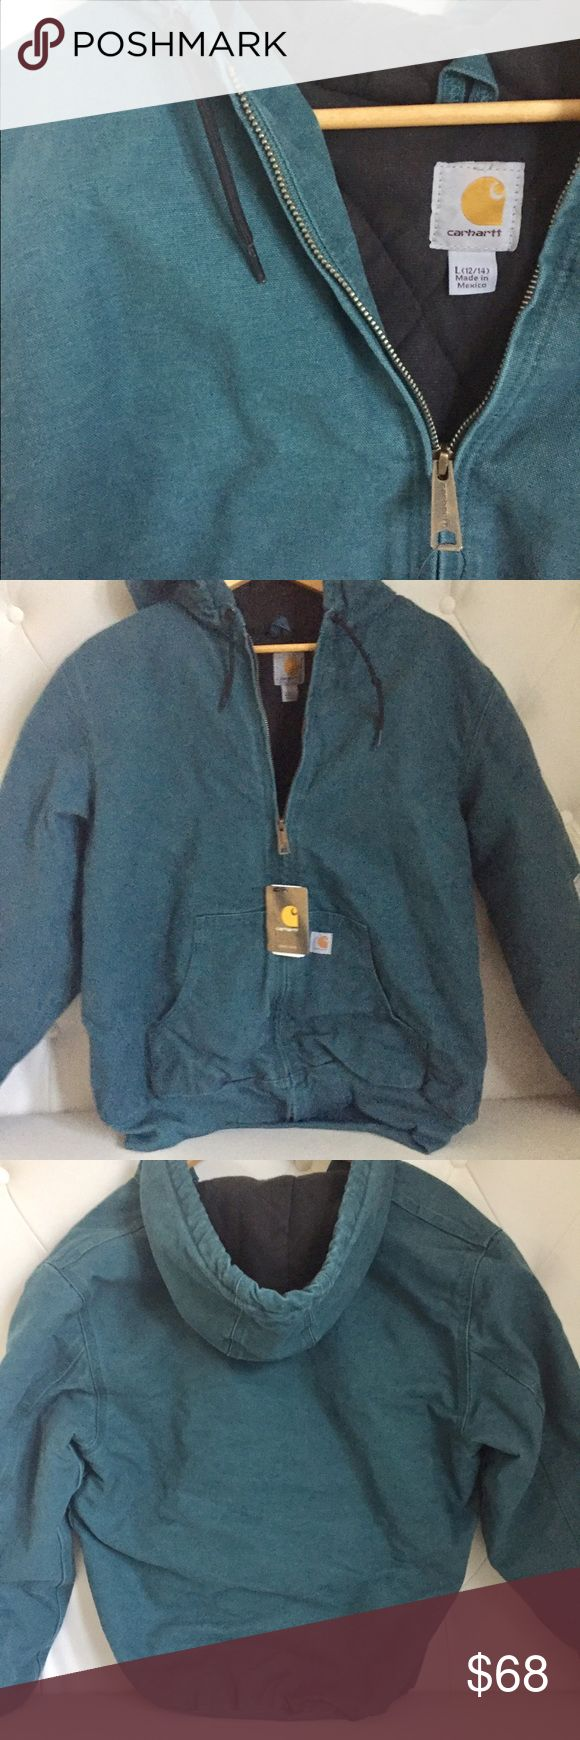 Carhartt Coat Super warm,  teal Carhartt coat with hood. Never worn Carhartt Jackets & Coats